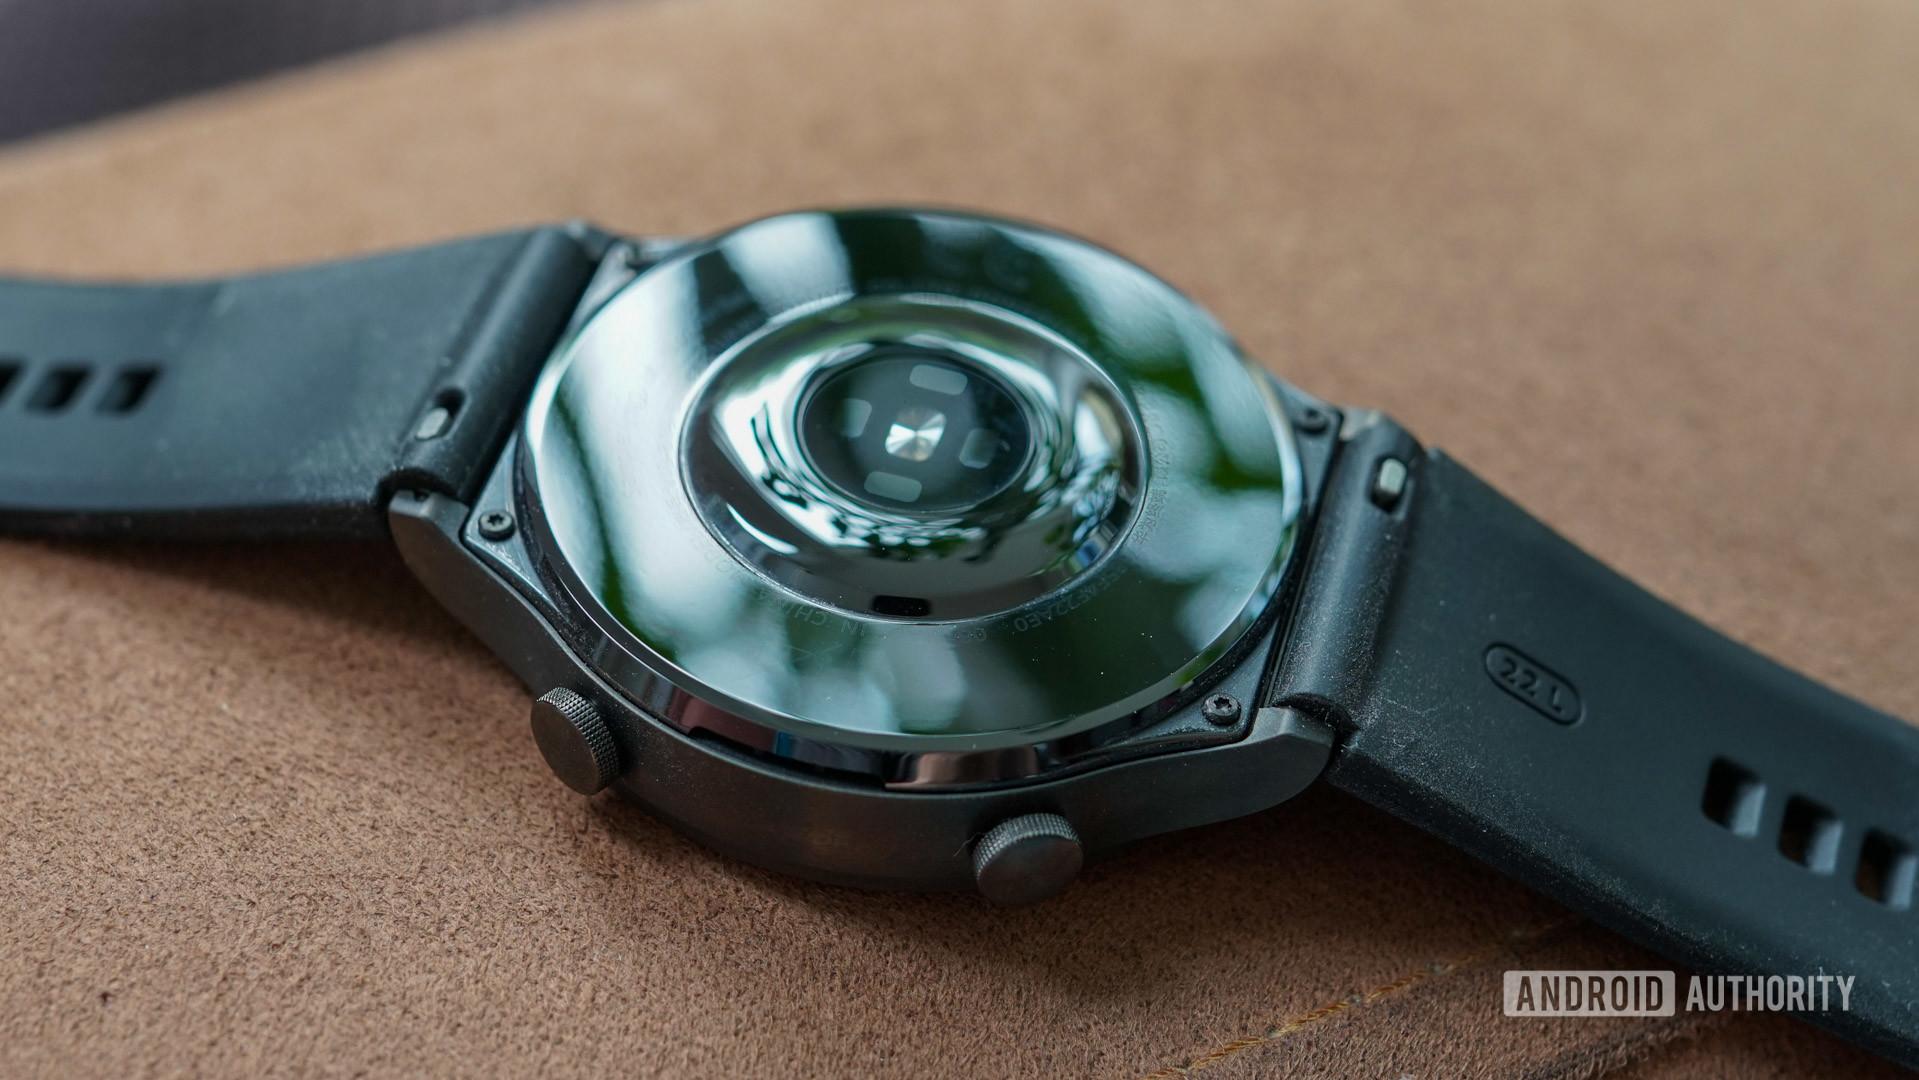 Huawei Watch GT 2 Pro ceramic back and sensors